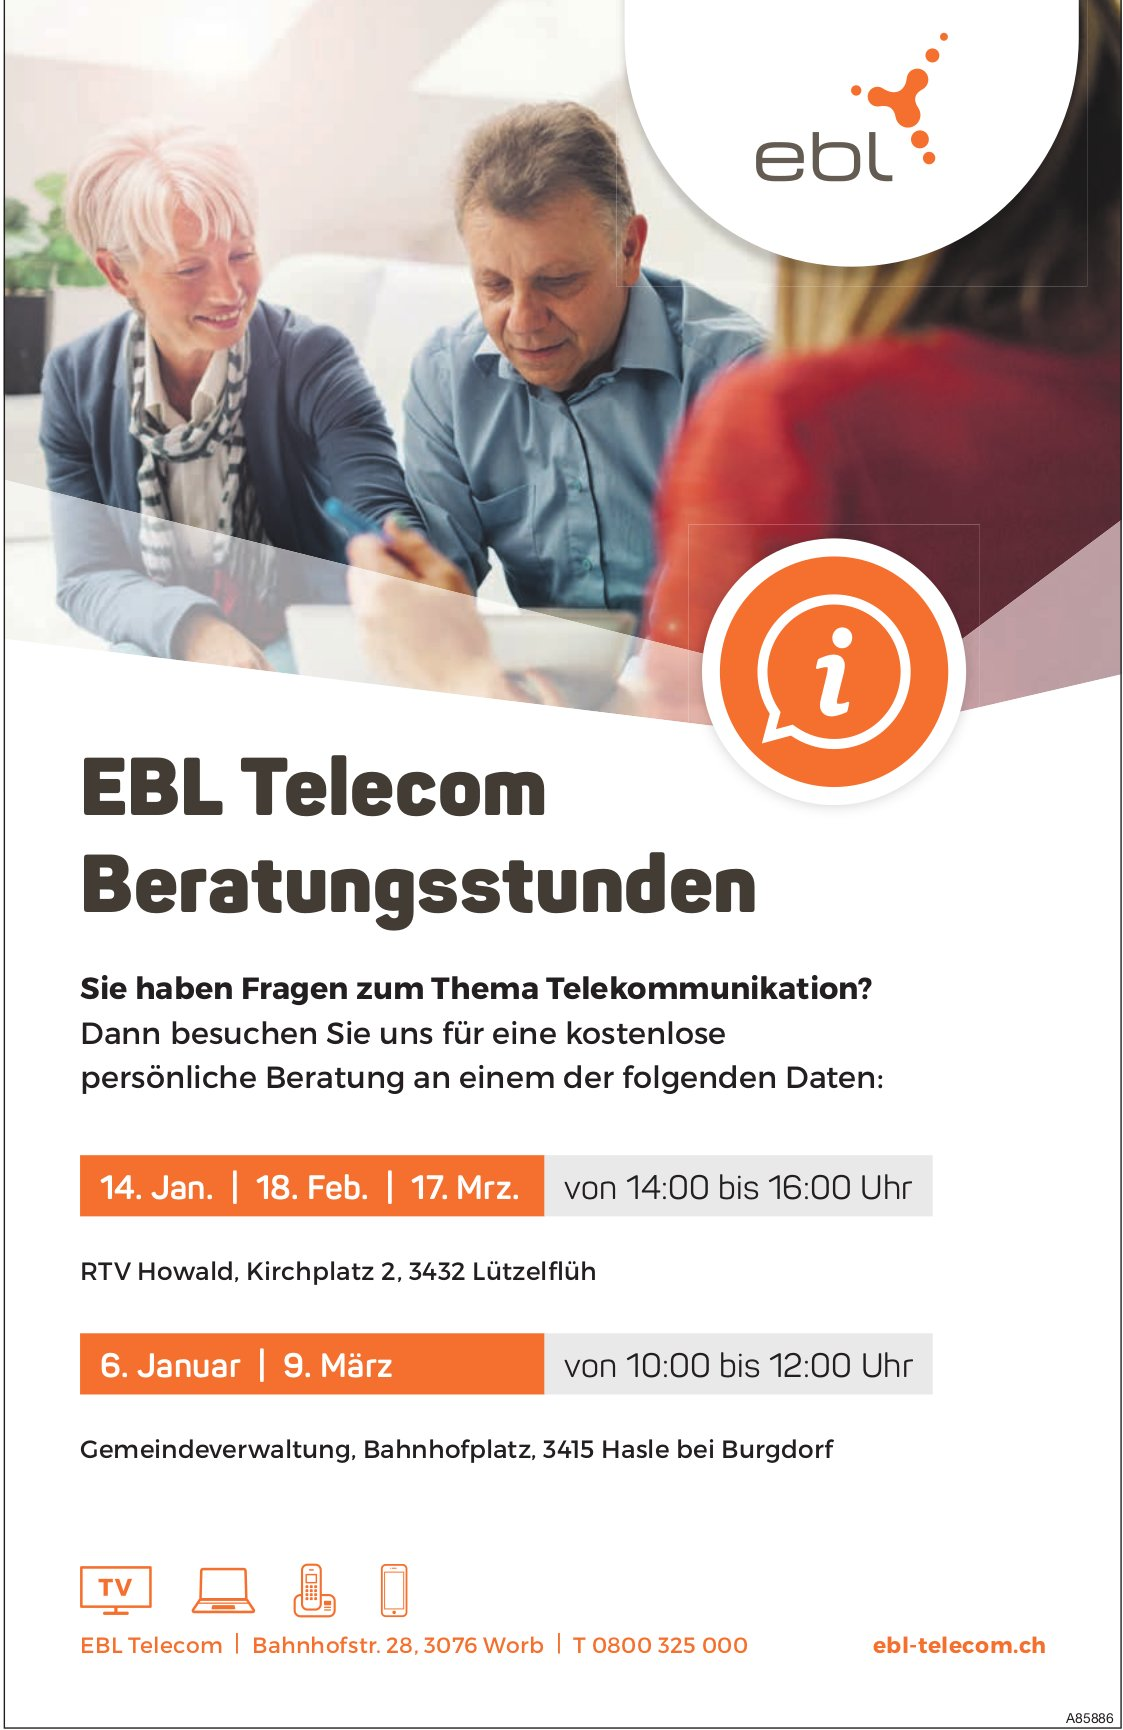 EBL Telecom Beratungsstunden, 18. Februar & 9. + 17. März, Lützelflüh & Hasle bei Burgdorf